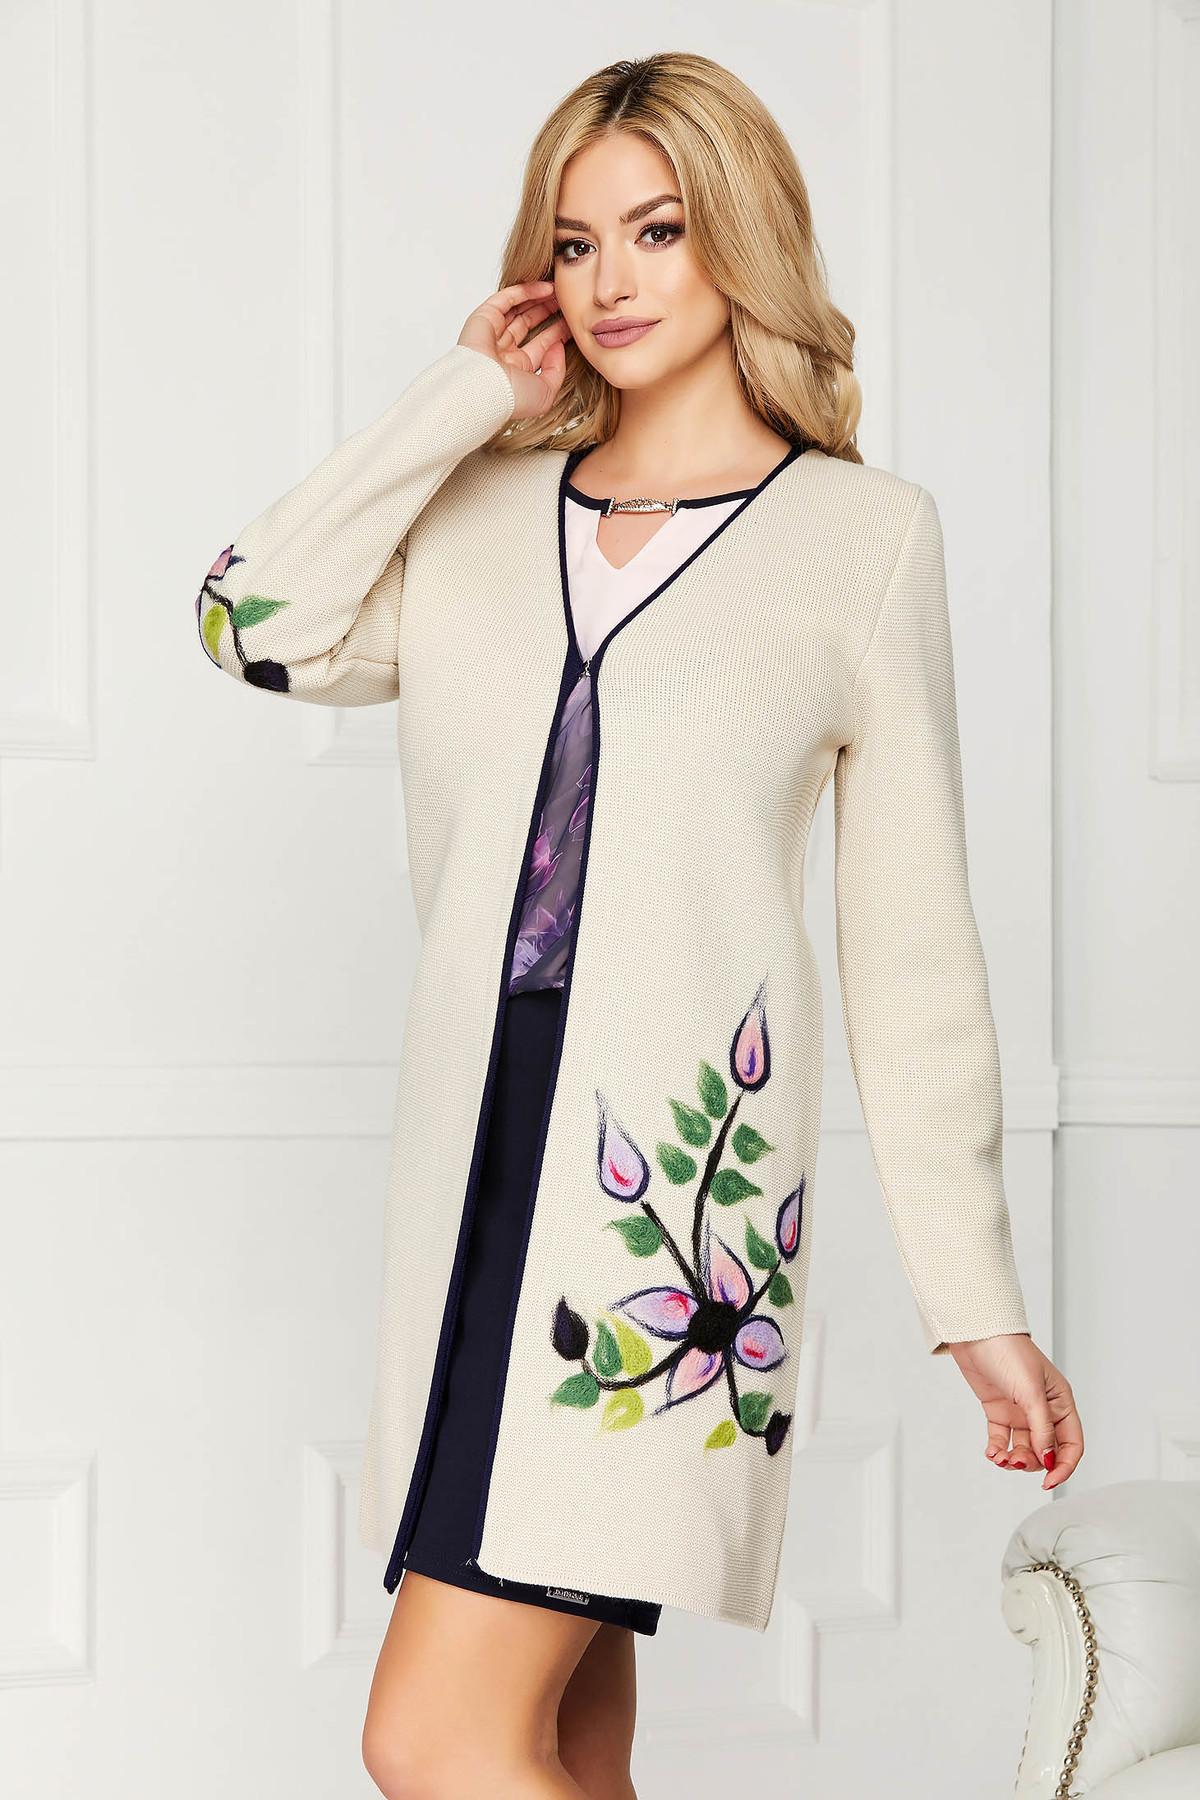 Cardigan crem elegant din lana cu un croi drept cu maneci lungi si broderie florala